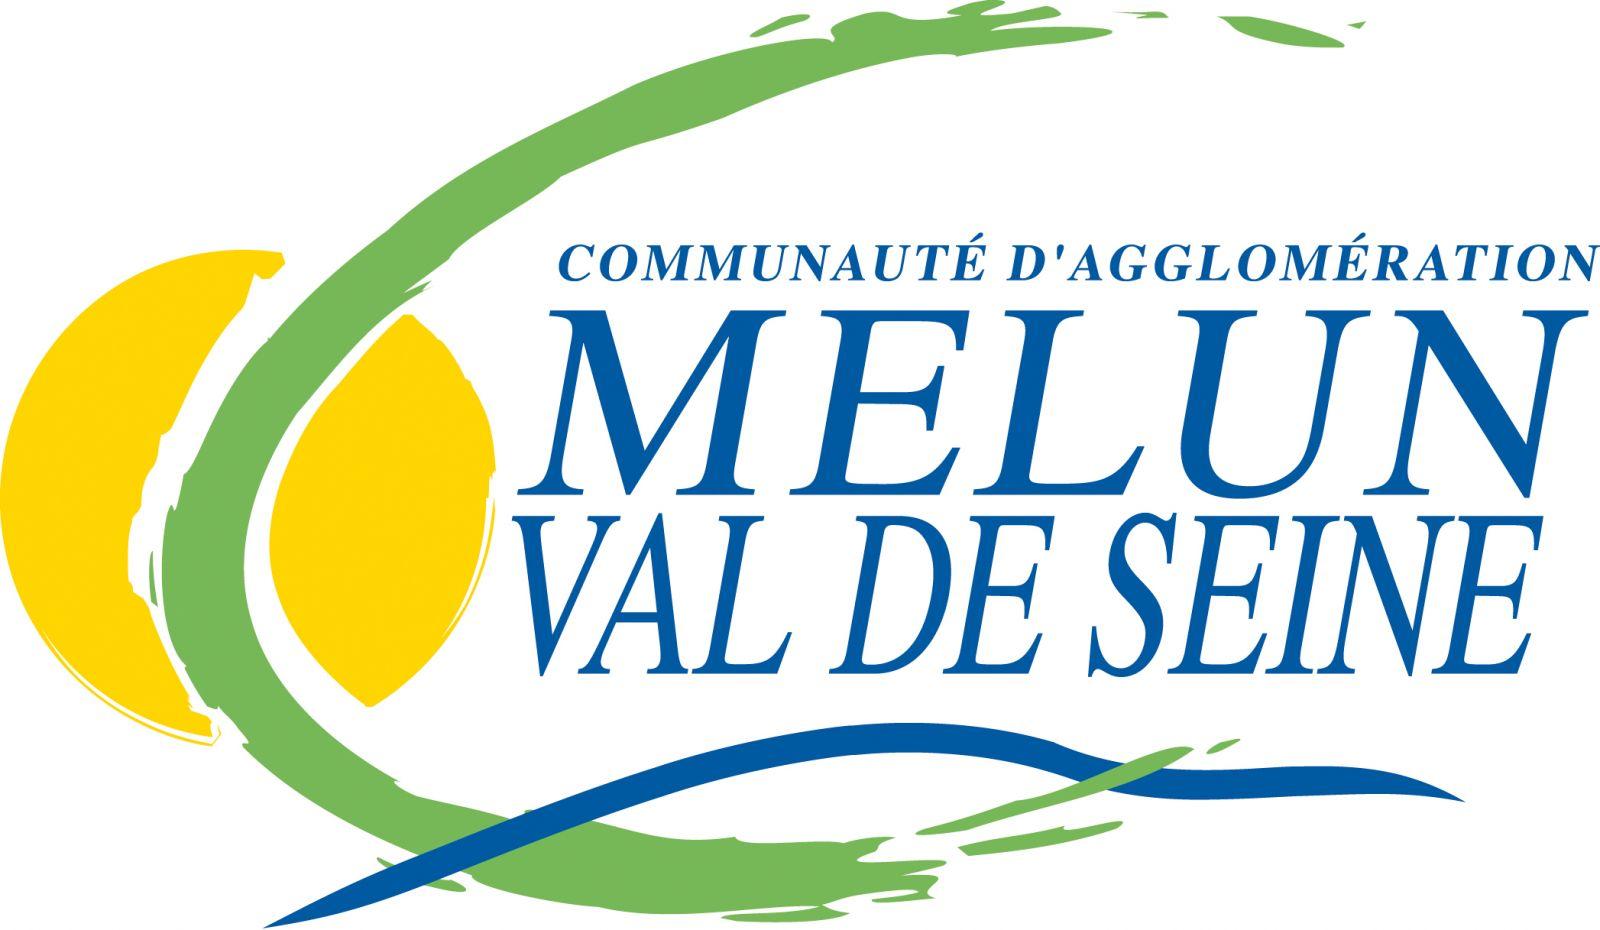 CA MELUN VAL DE SEINE